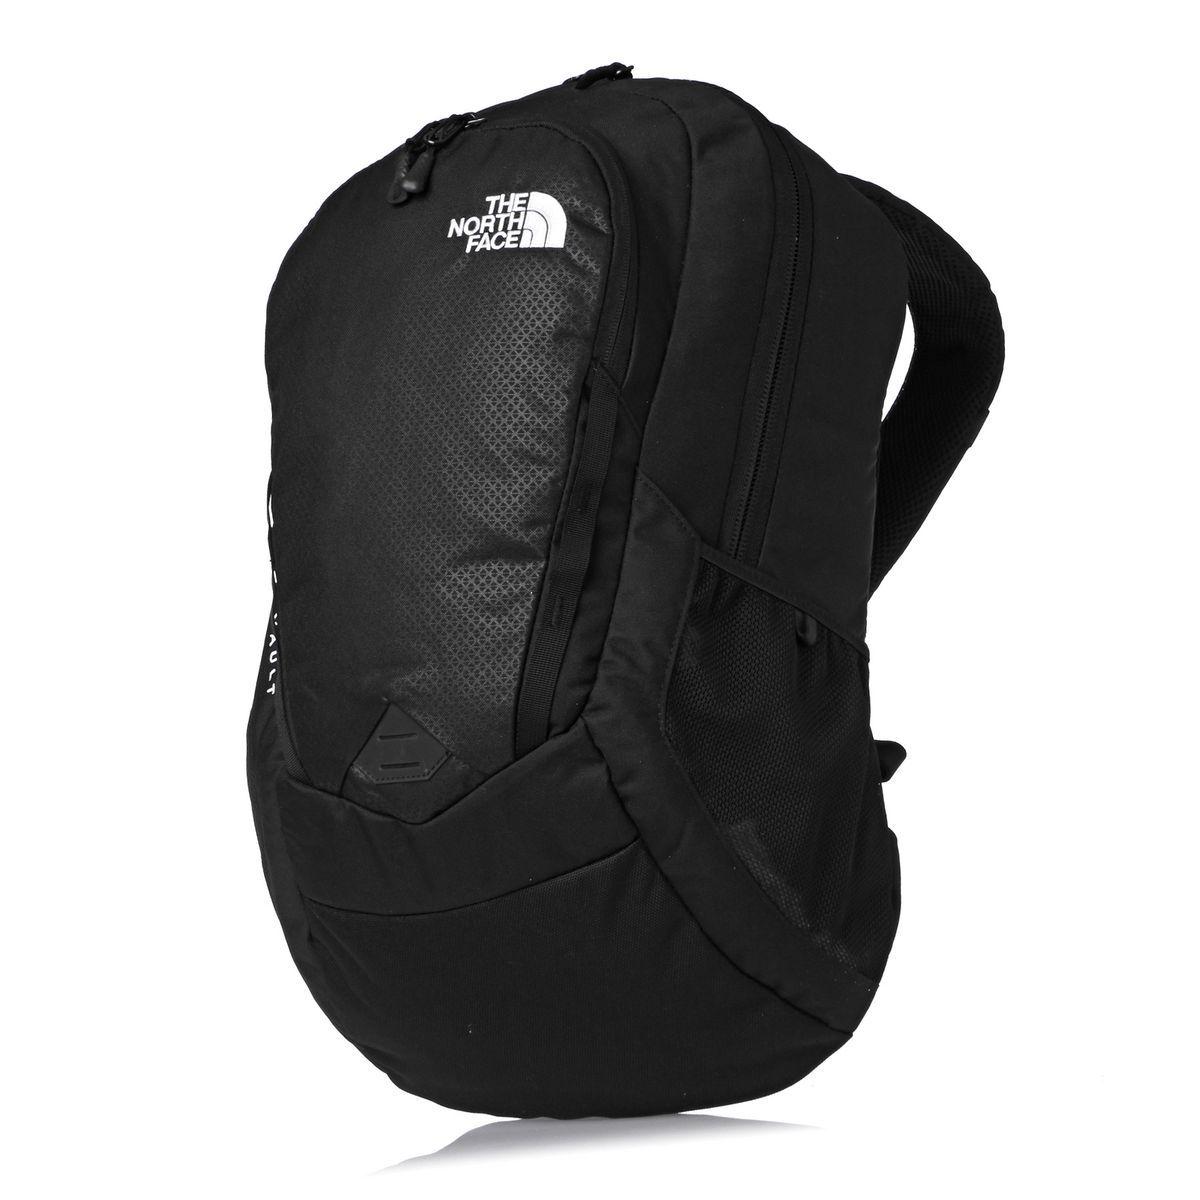 5f1dbb02b1 The North Face Vault Backpack - Tnf Black